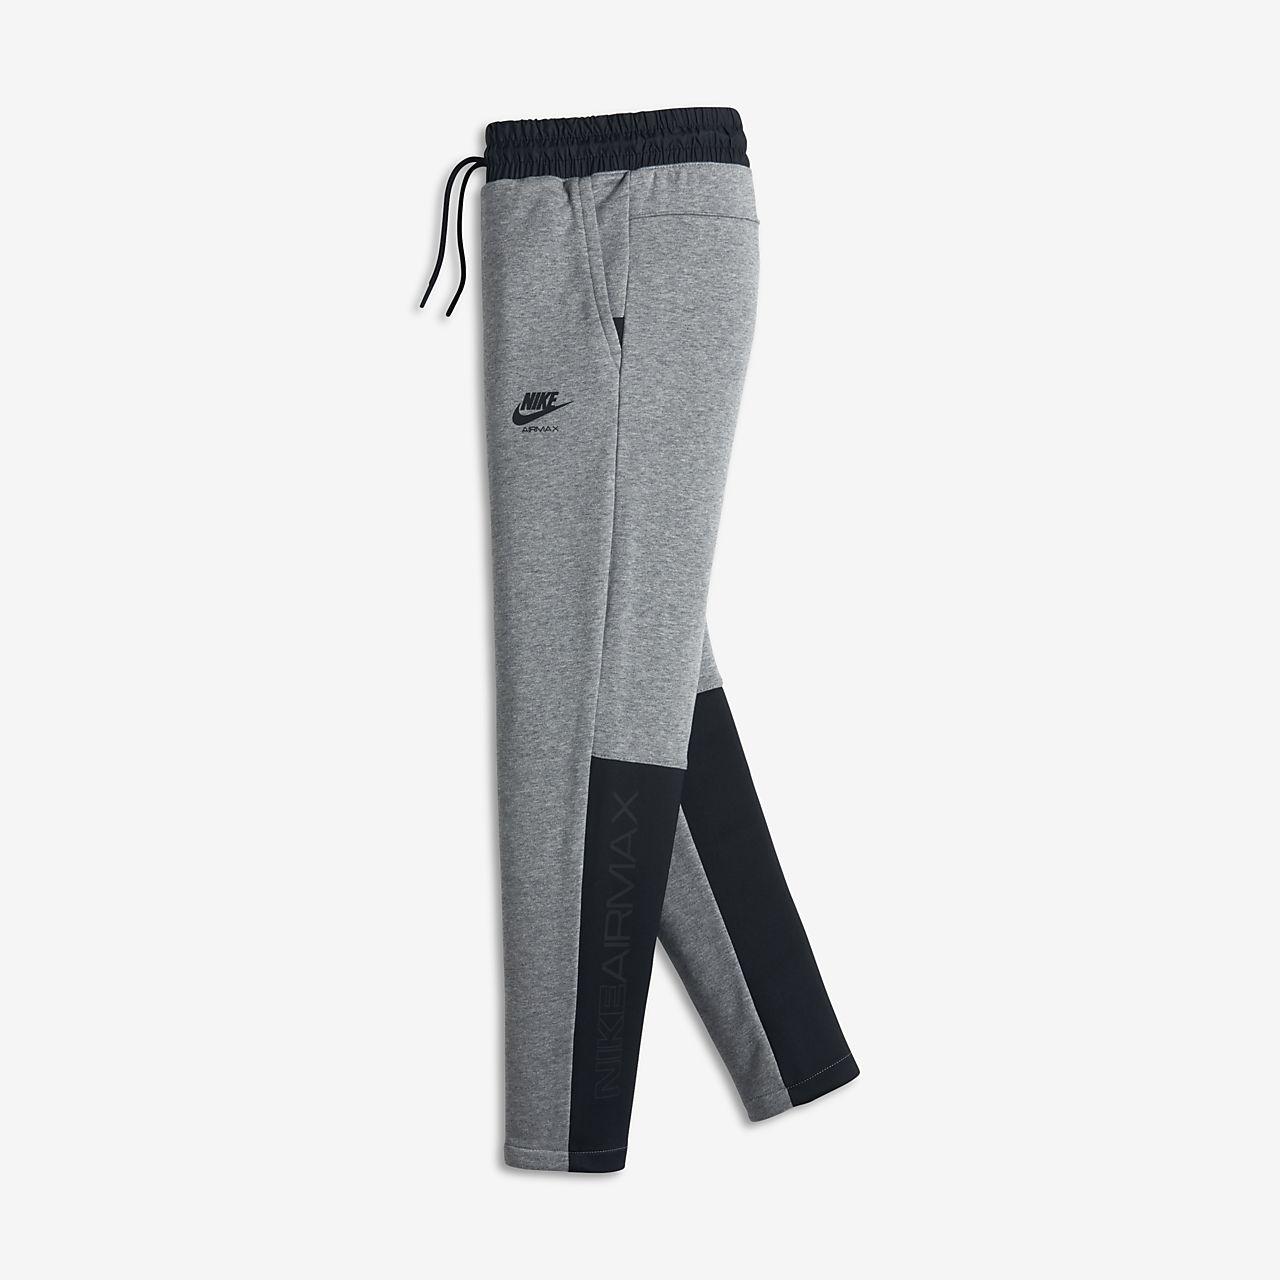 0qwa57q Garçon Air Plus Pantalon Pour Max Âgé Be Nike H84zqOTT